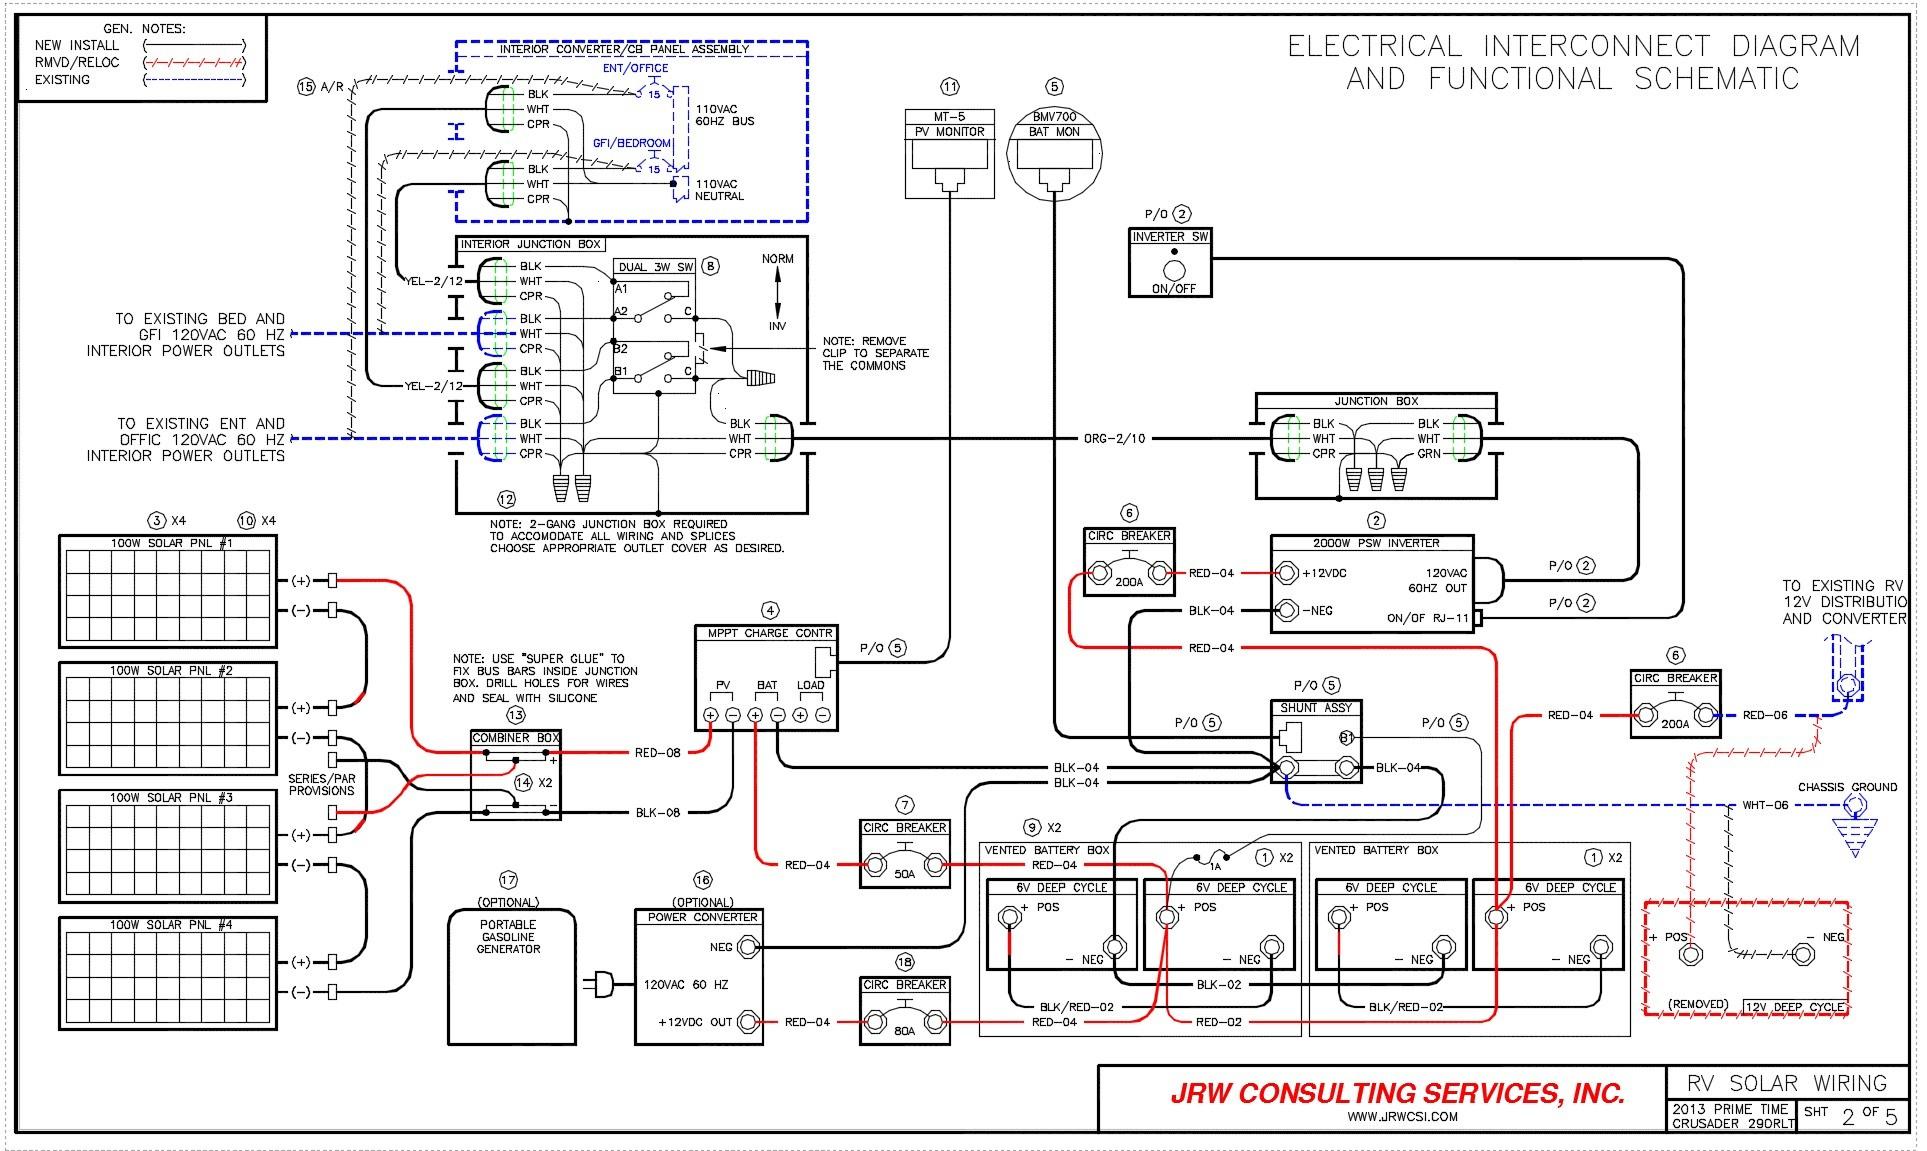 Fantastic 6500R Vent Wiring Diagram | Wiring Diagram - Fantastic Fan Wiring Diagram